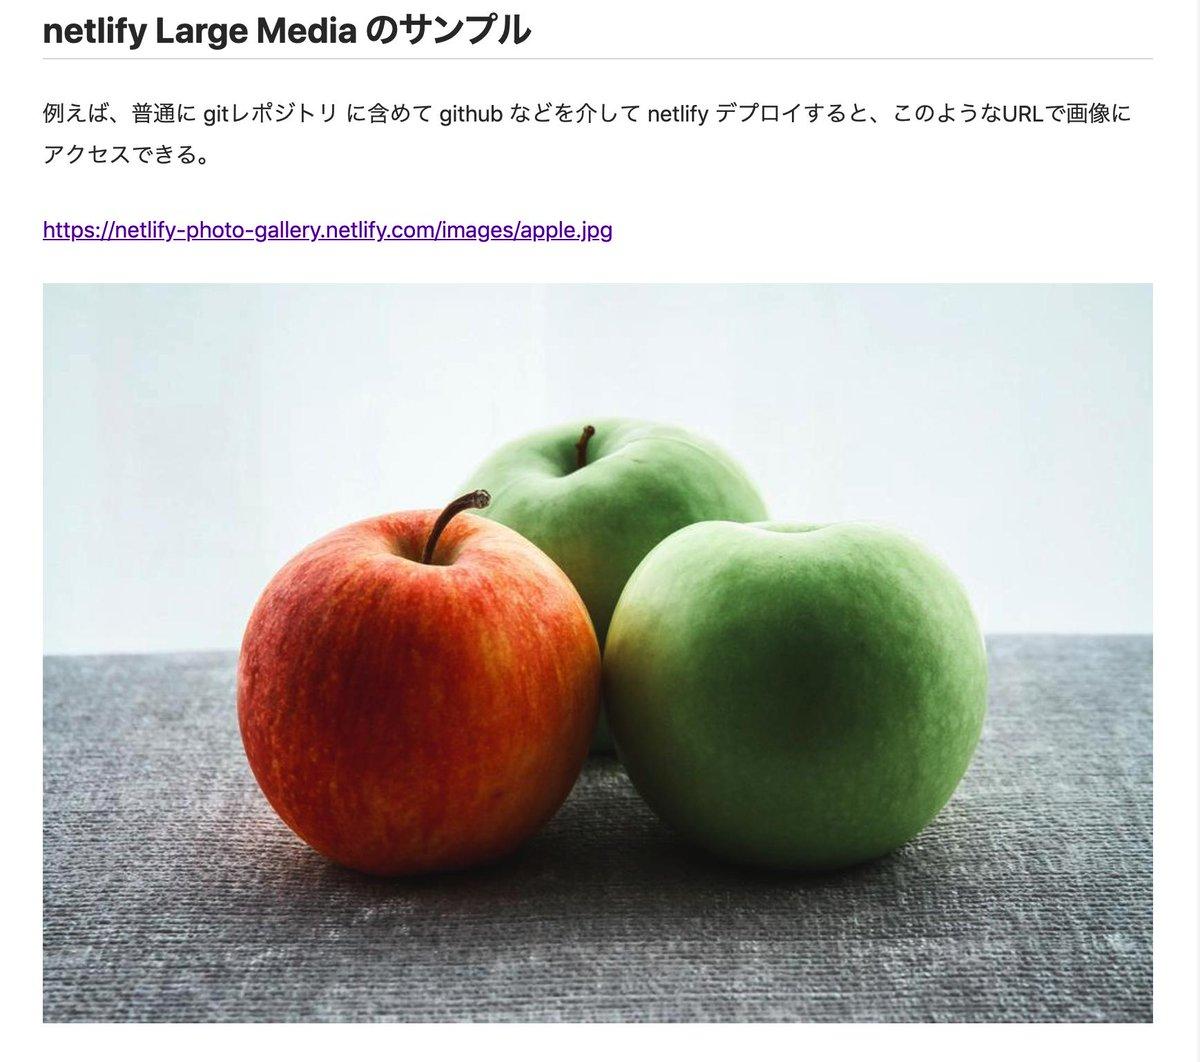 URLパラメータつけるだけで、画像を簡単にリサイズやクロップ出来るの、まじ netlify 便利。こんな感じで、URLパラメータでクロップした画像 crop してくれる。